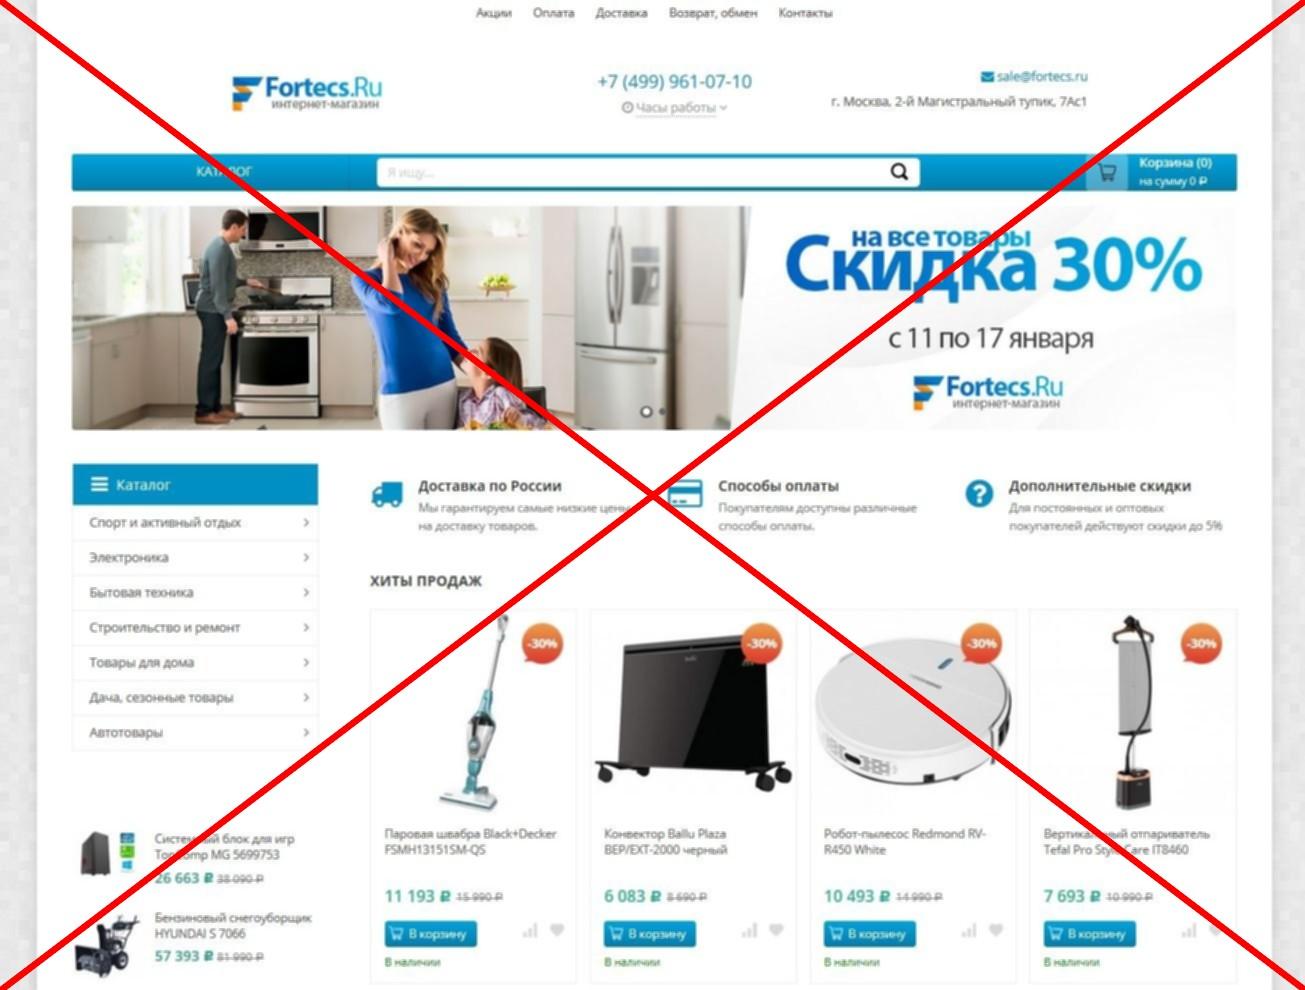 Скрин лохотрона fortecs.ru